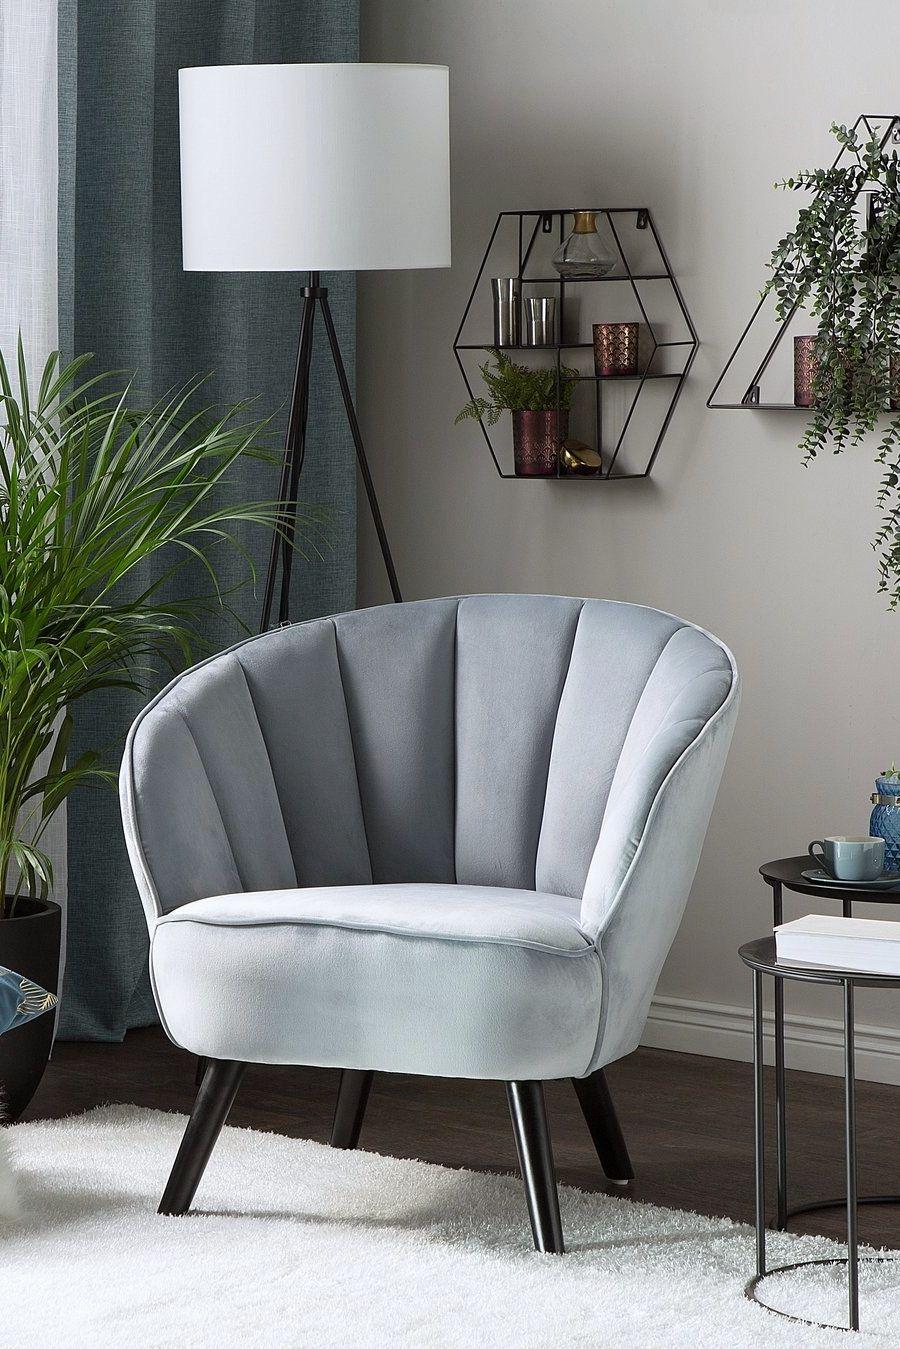 Fotel Welur Jasnoszary Dala W 2019 Salon Furniture Home Decor I